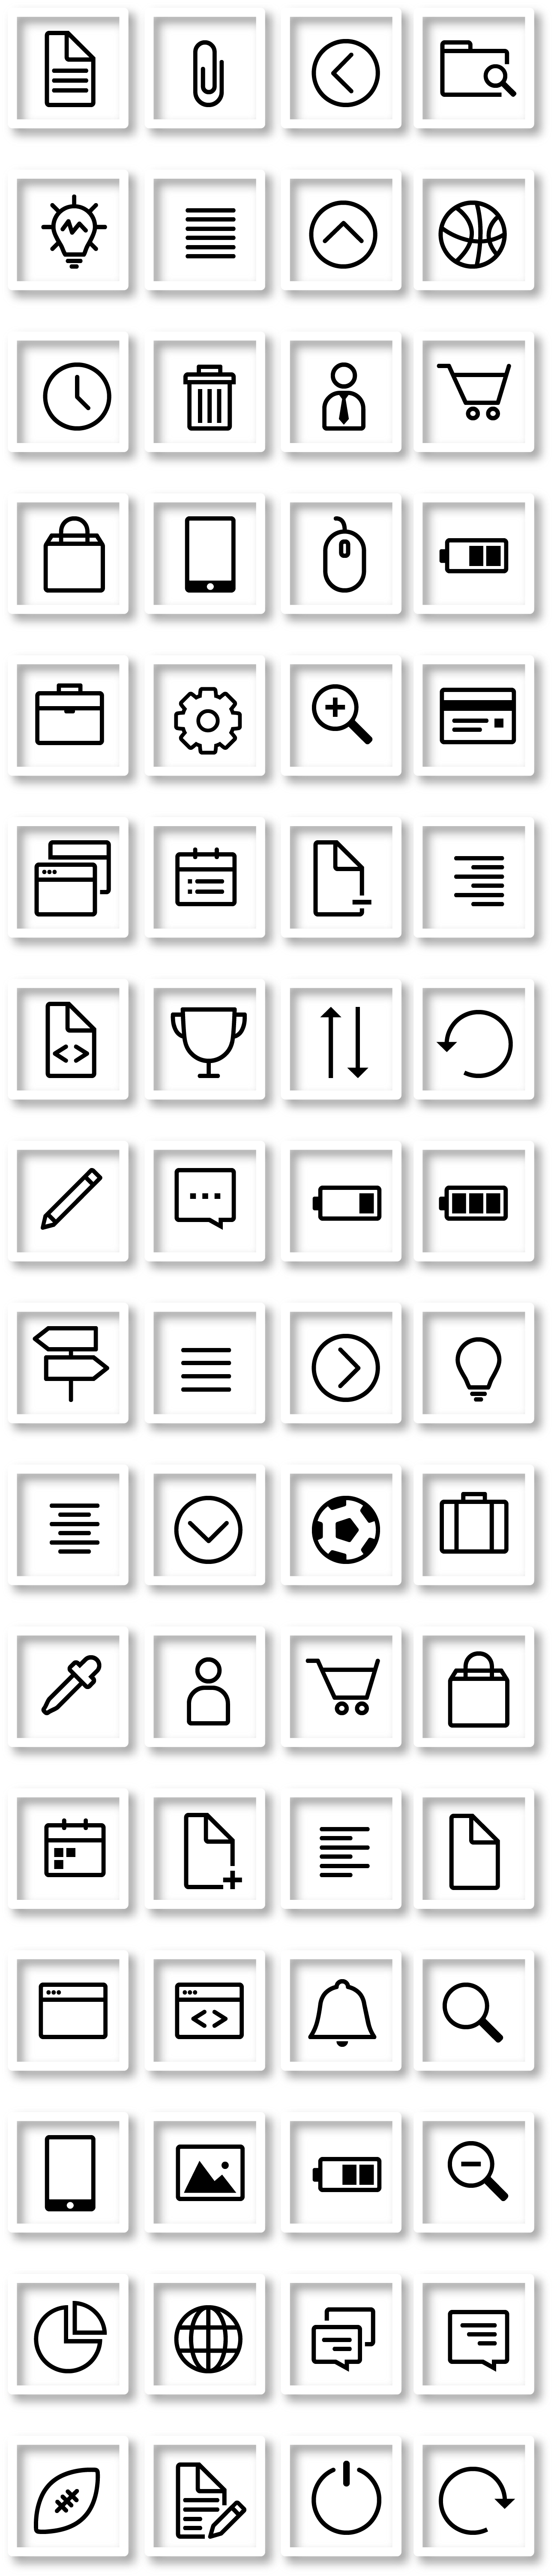 64 X-Mas Line Vector Icons